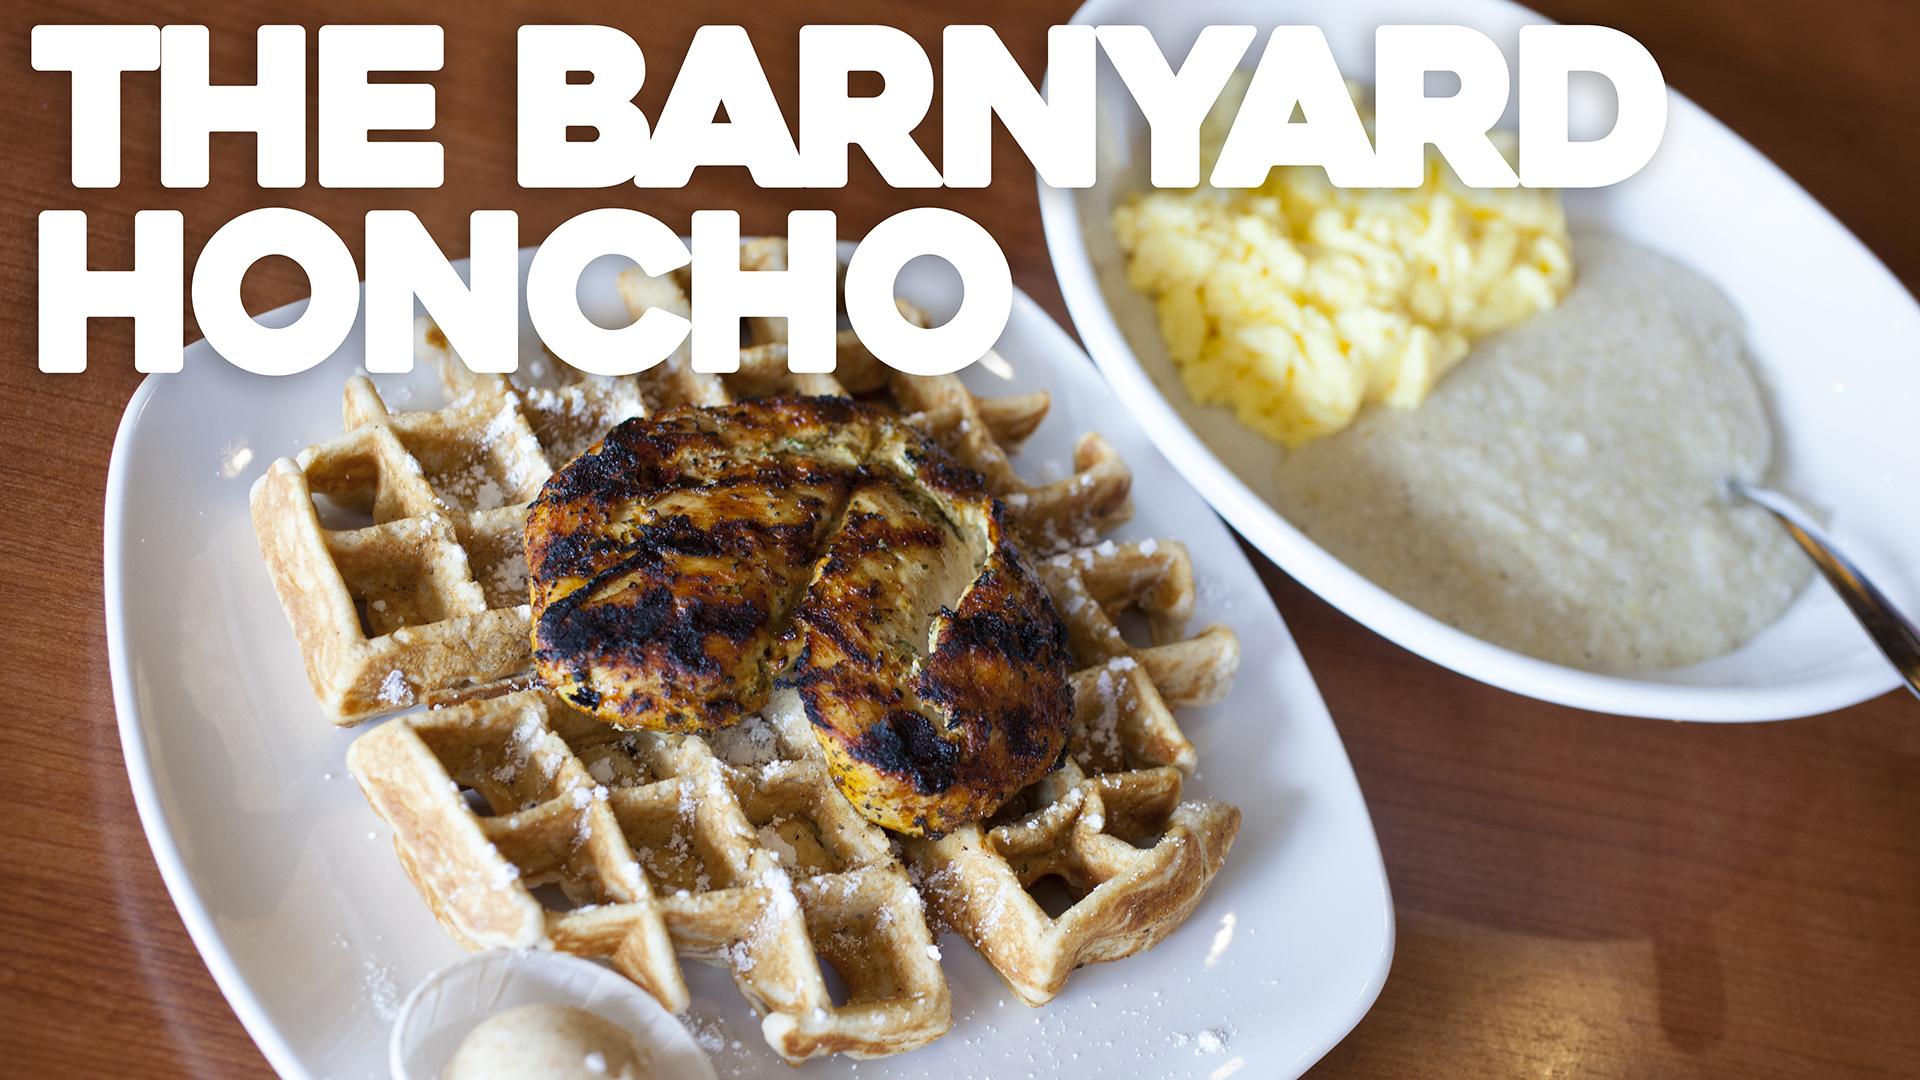 Barnyard Honcho